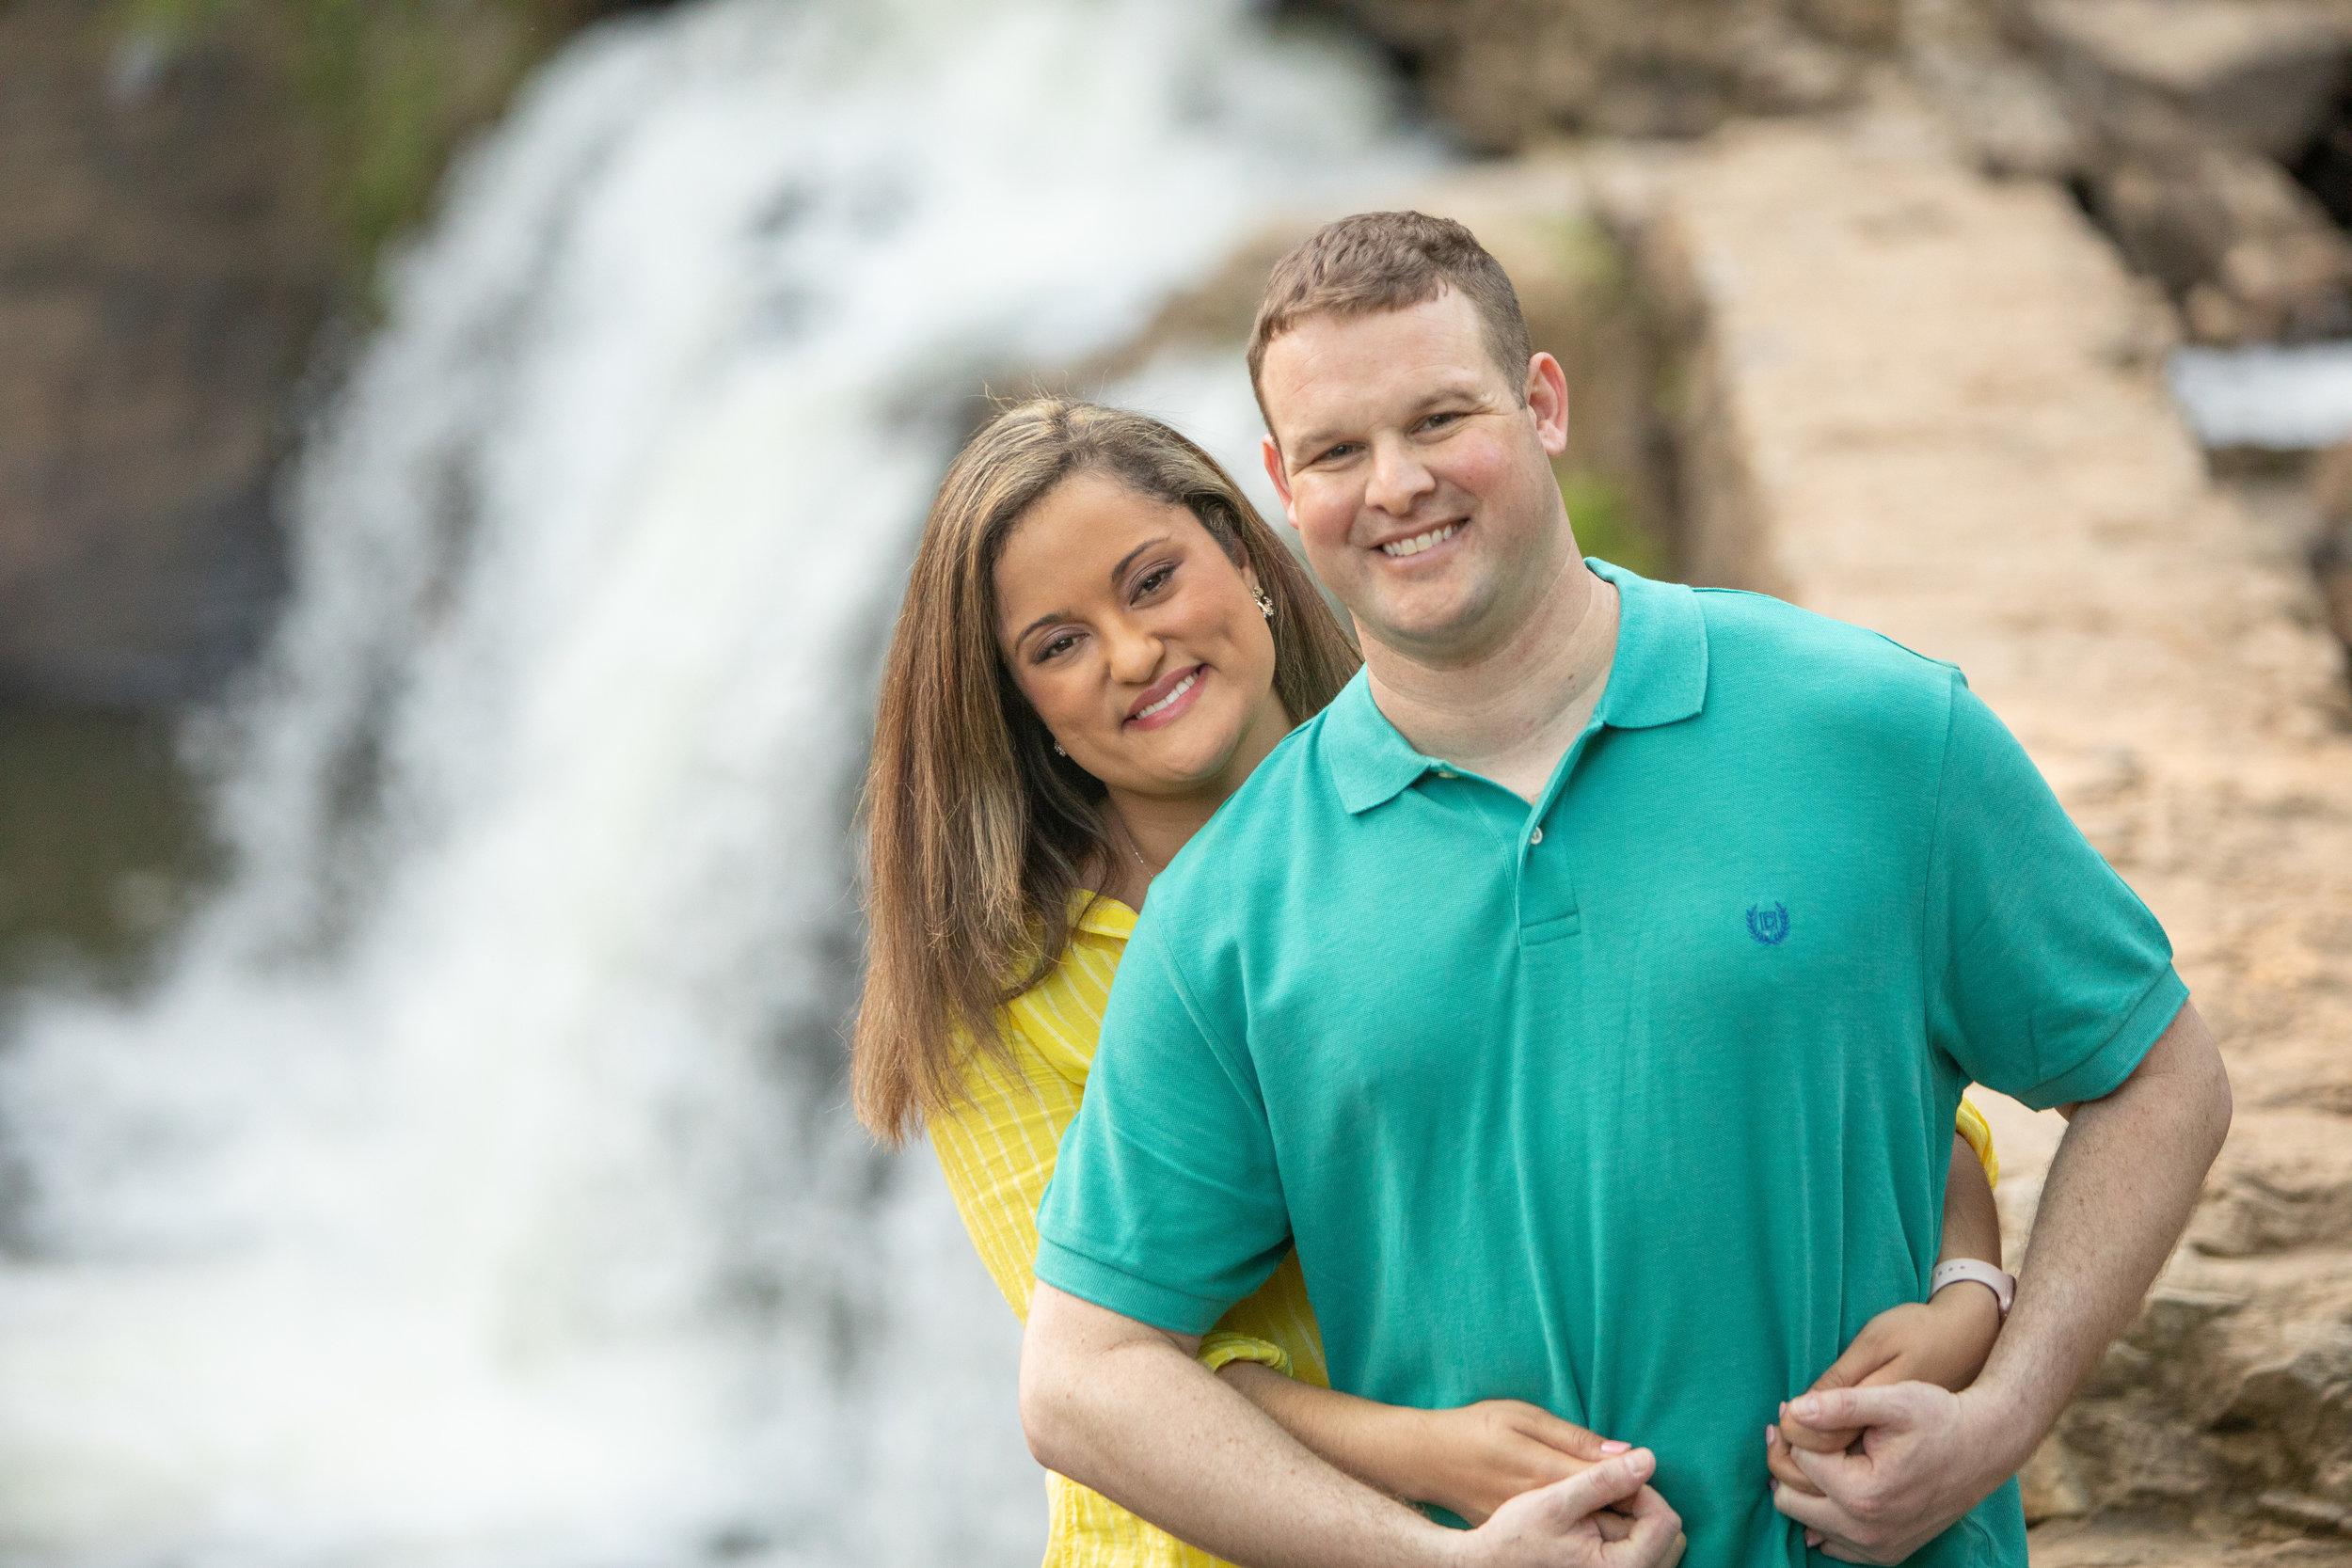 Photography by the Atlanta Wedding Photographers at AtlantaArtsticWeddings